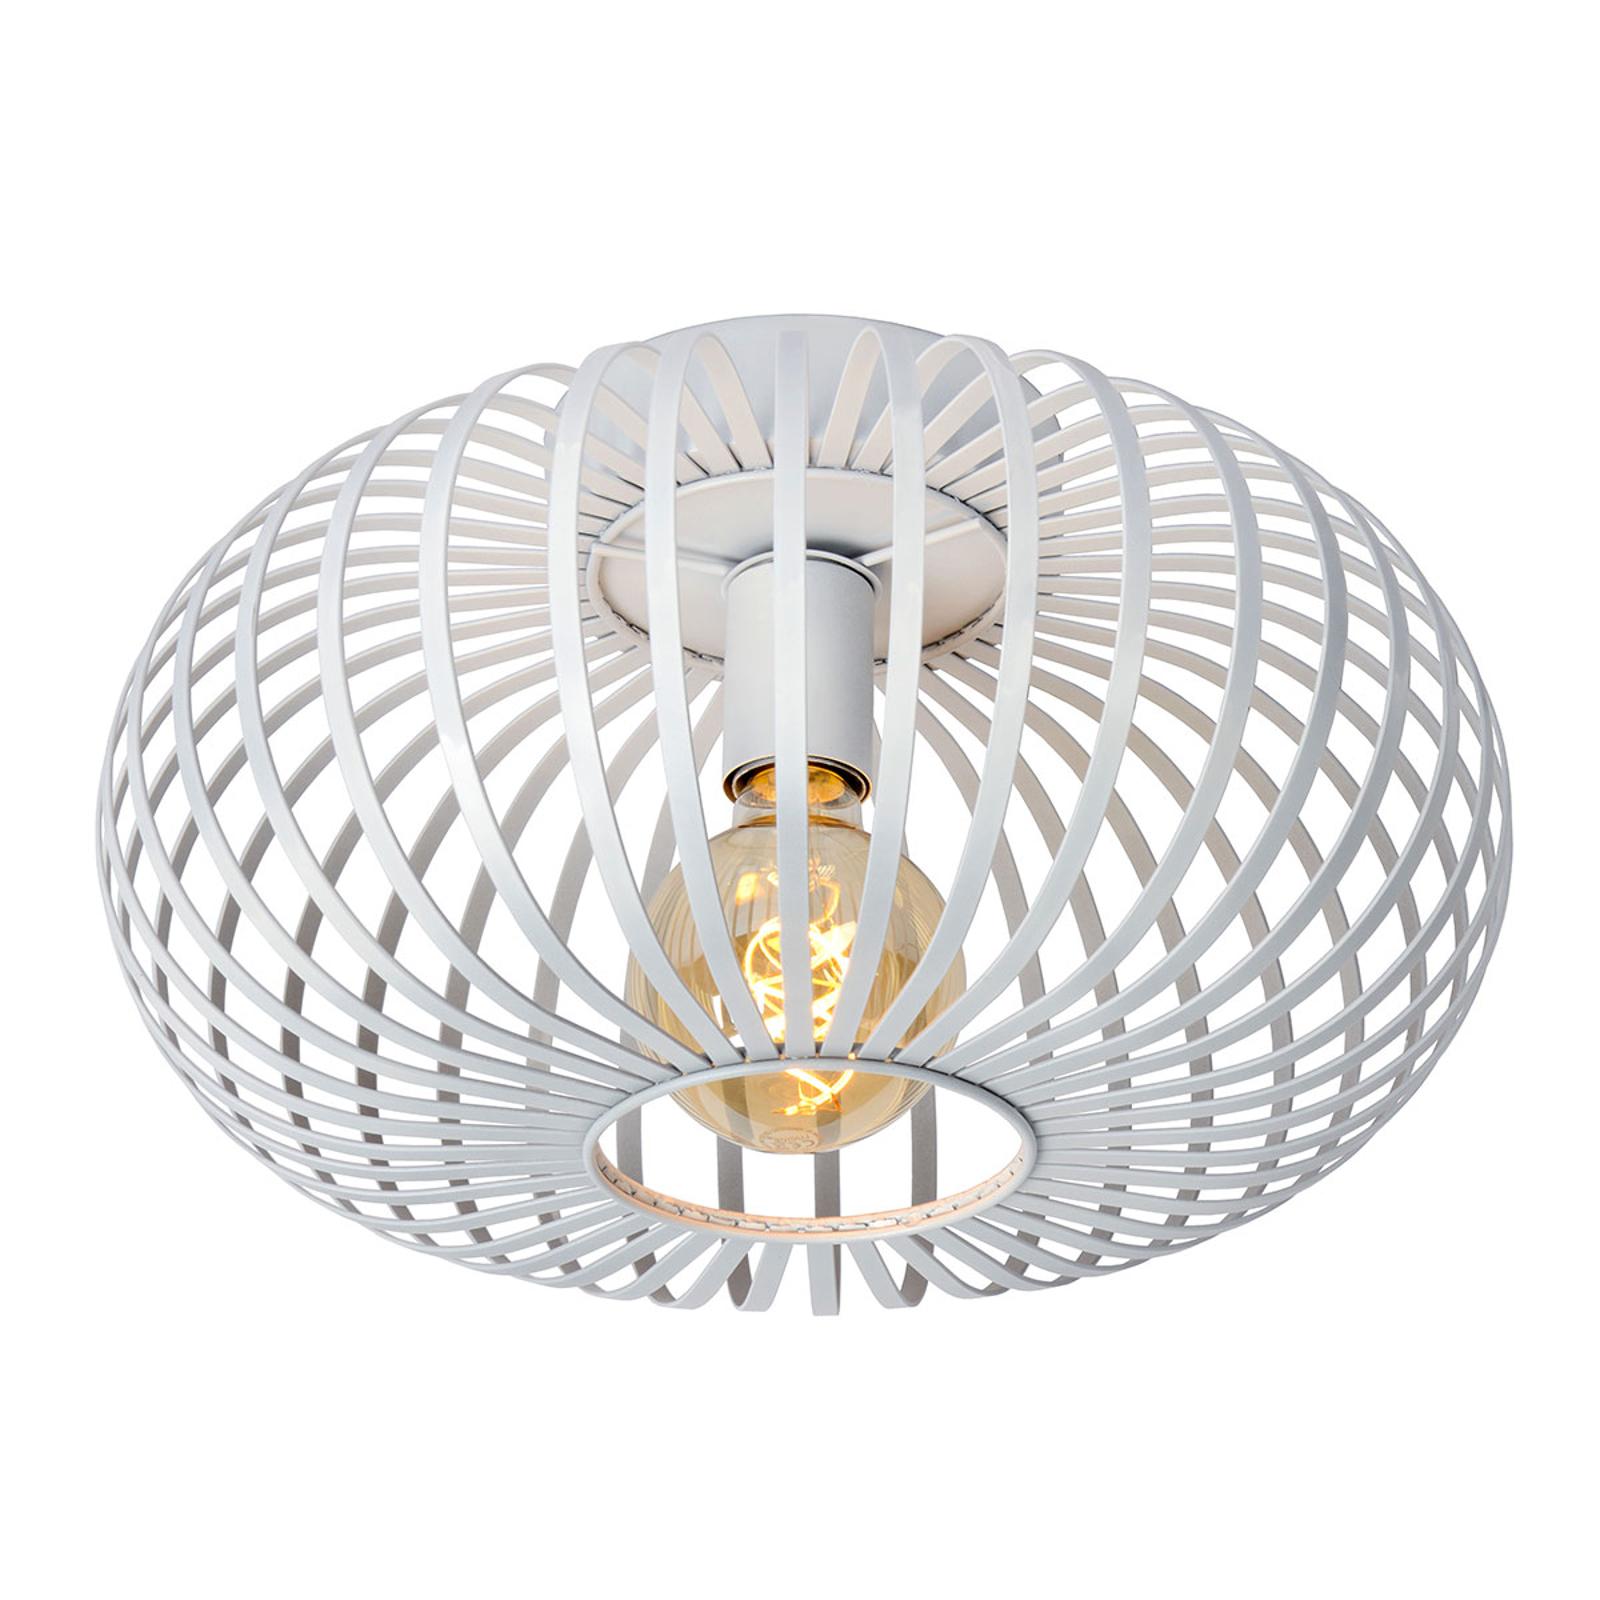 Manuela loftlampe med bur i hvid, 40 cm